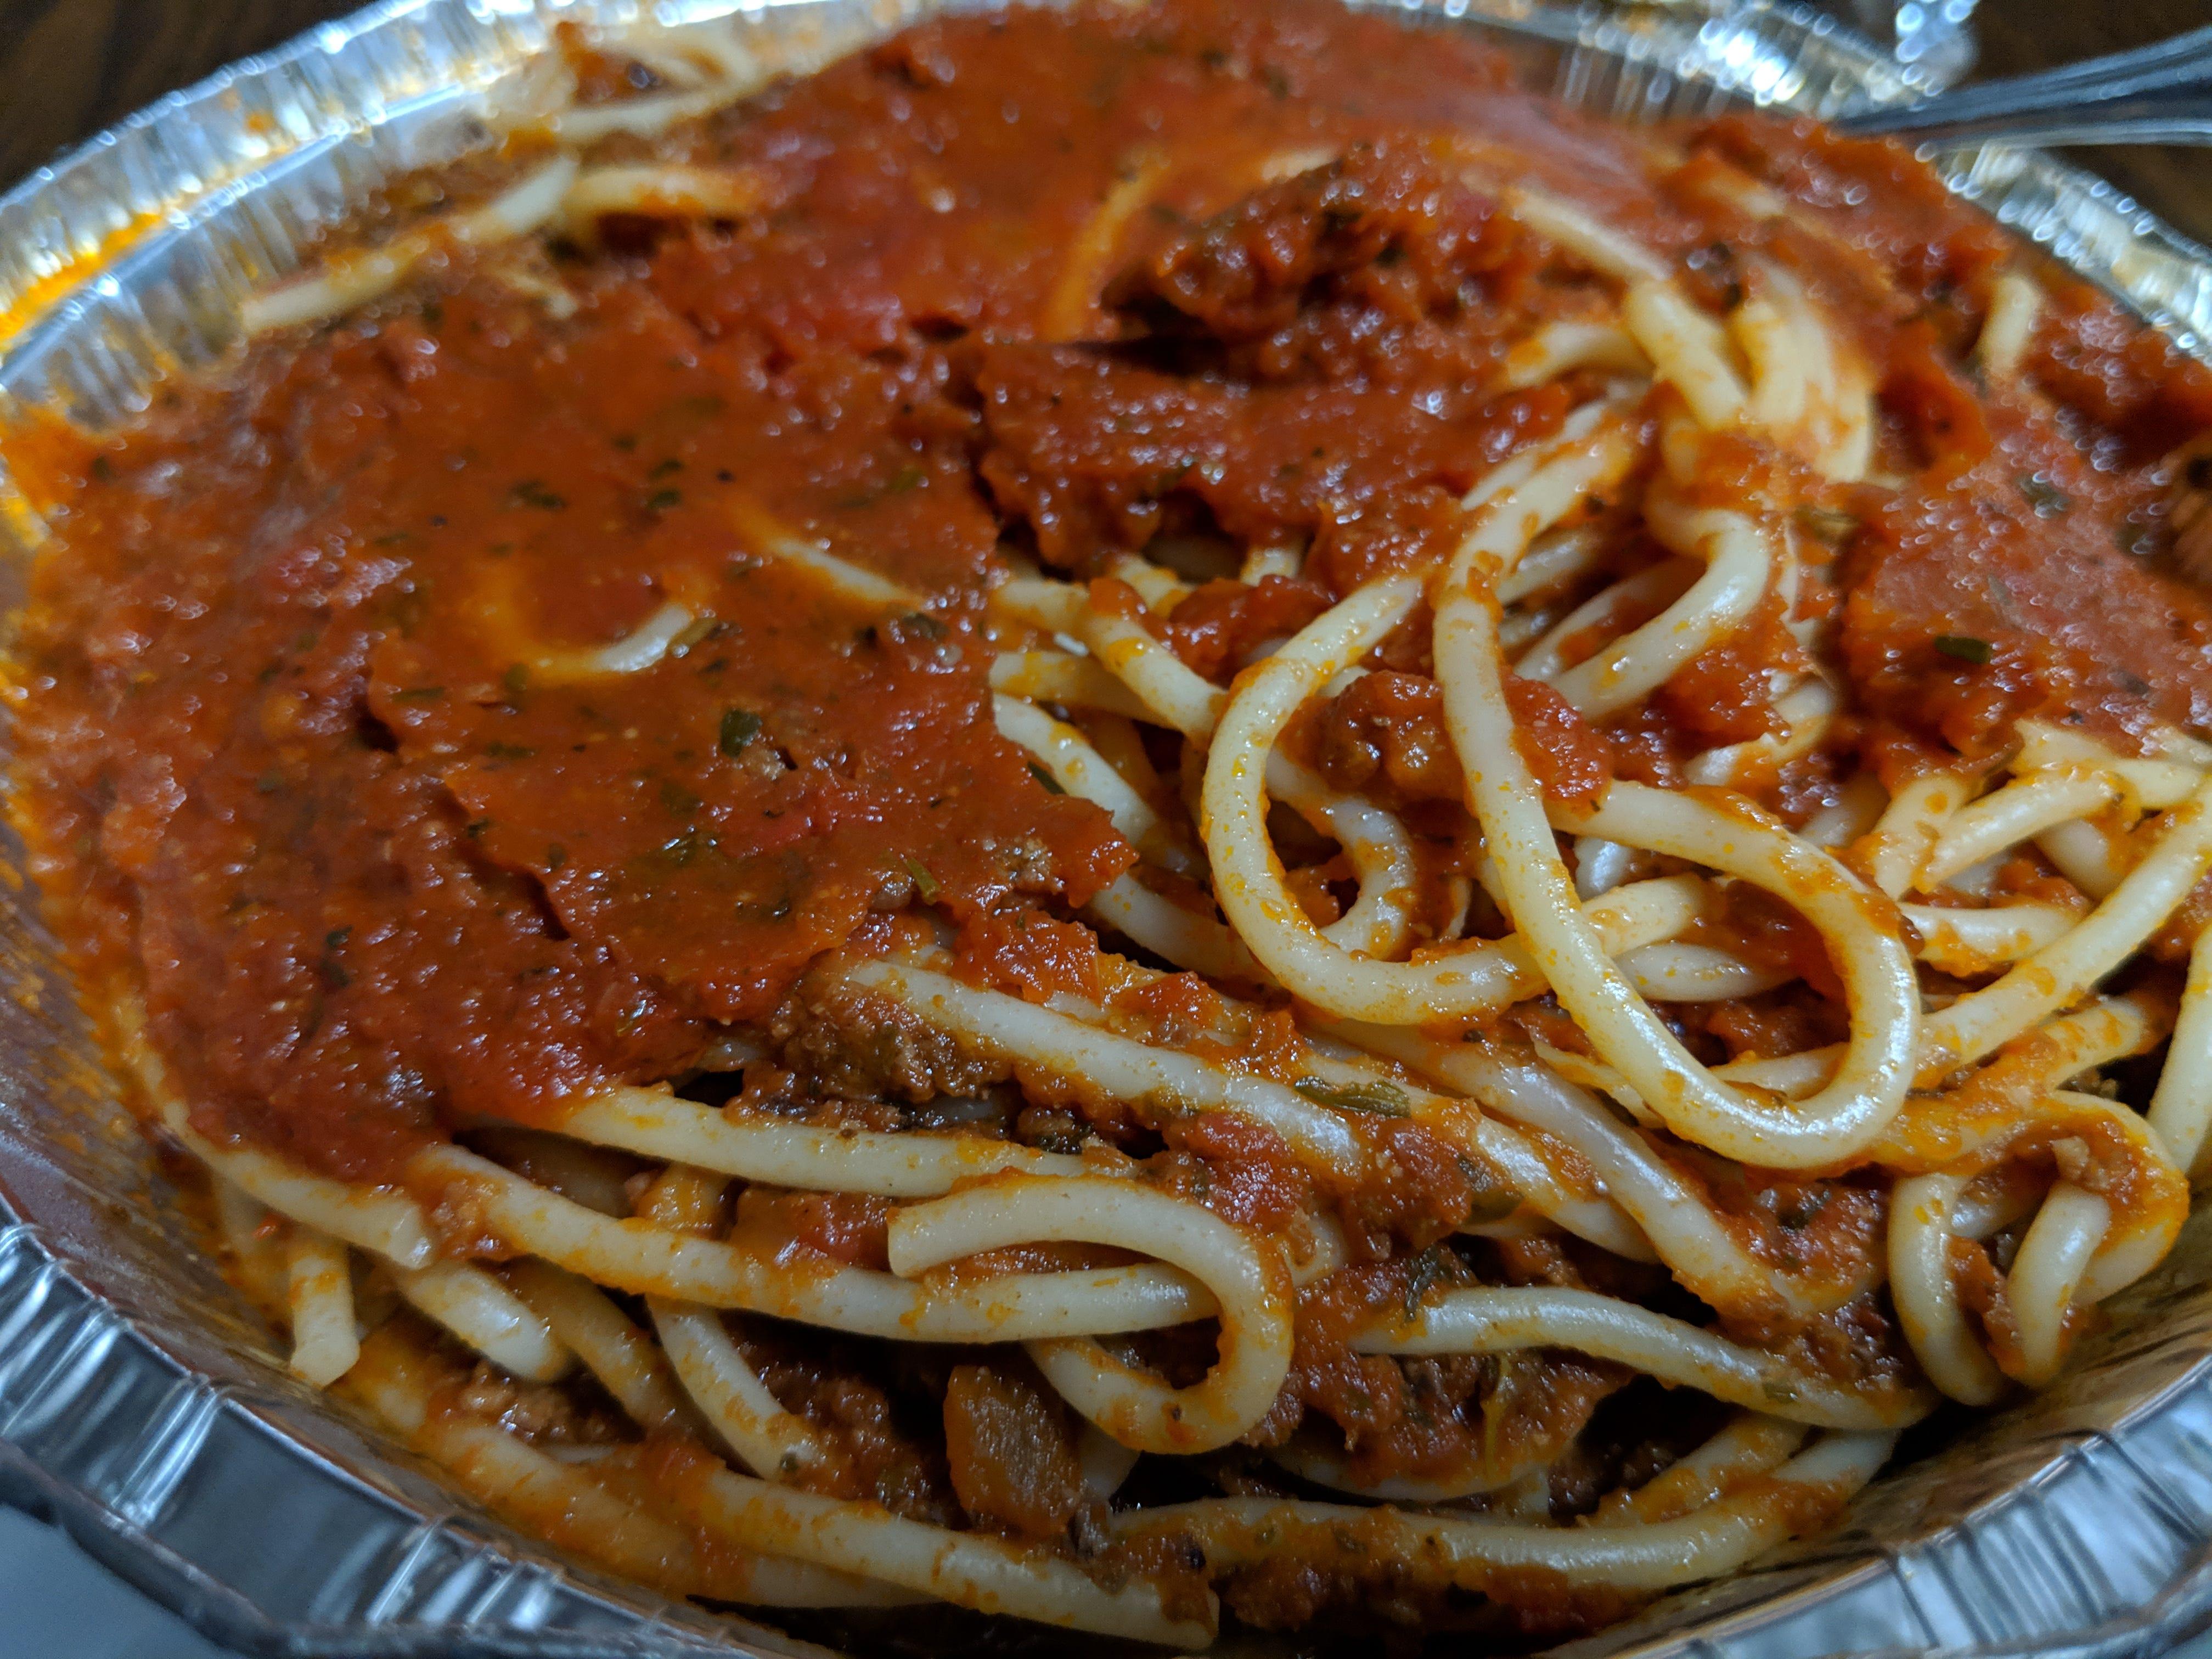 Spaghetti with meat sauce at Napoli's Italian Restaurant.